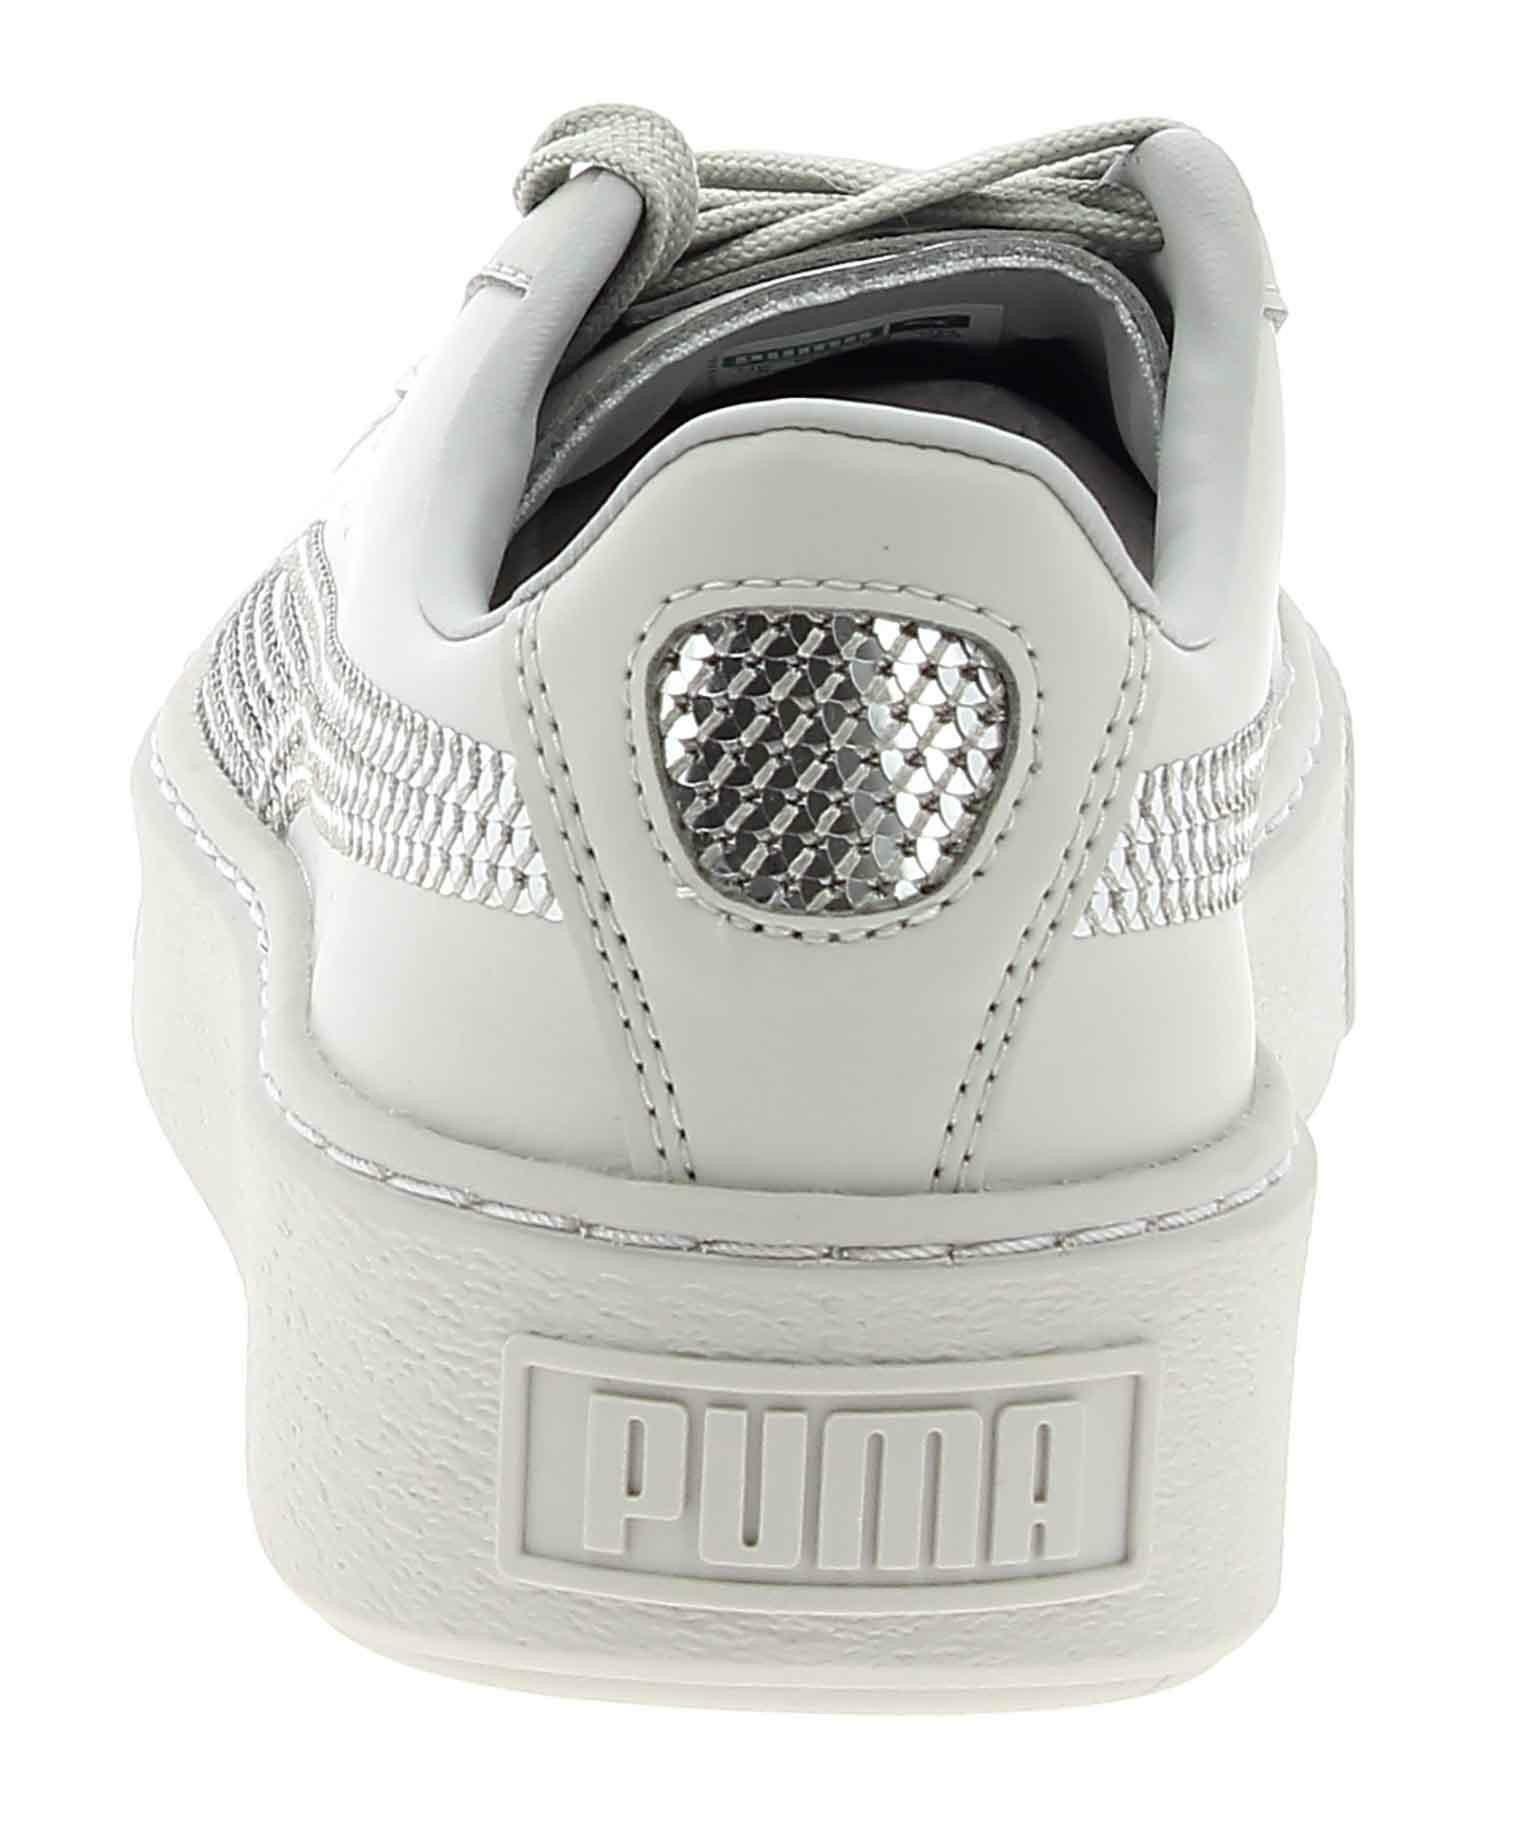 puma puma basket platform bling scarpe sportive grigie donna pailletes 36723702